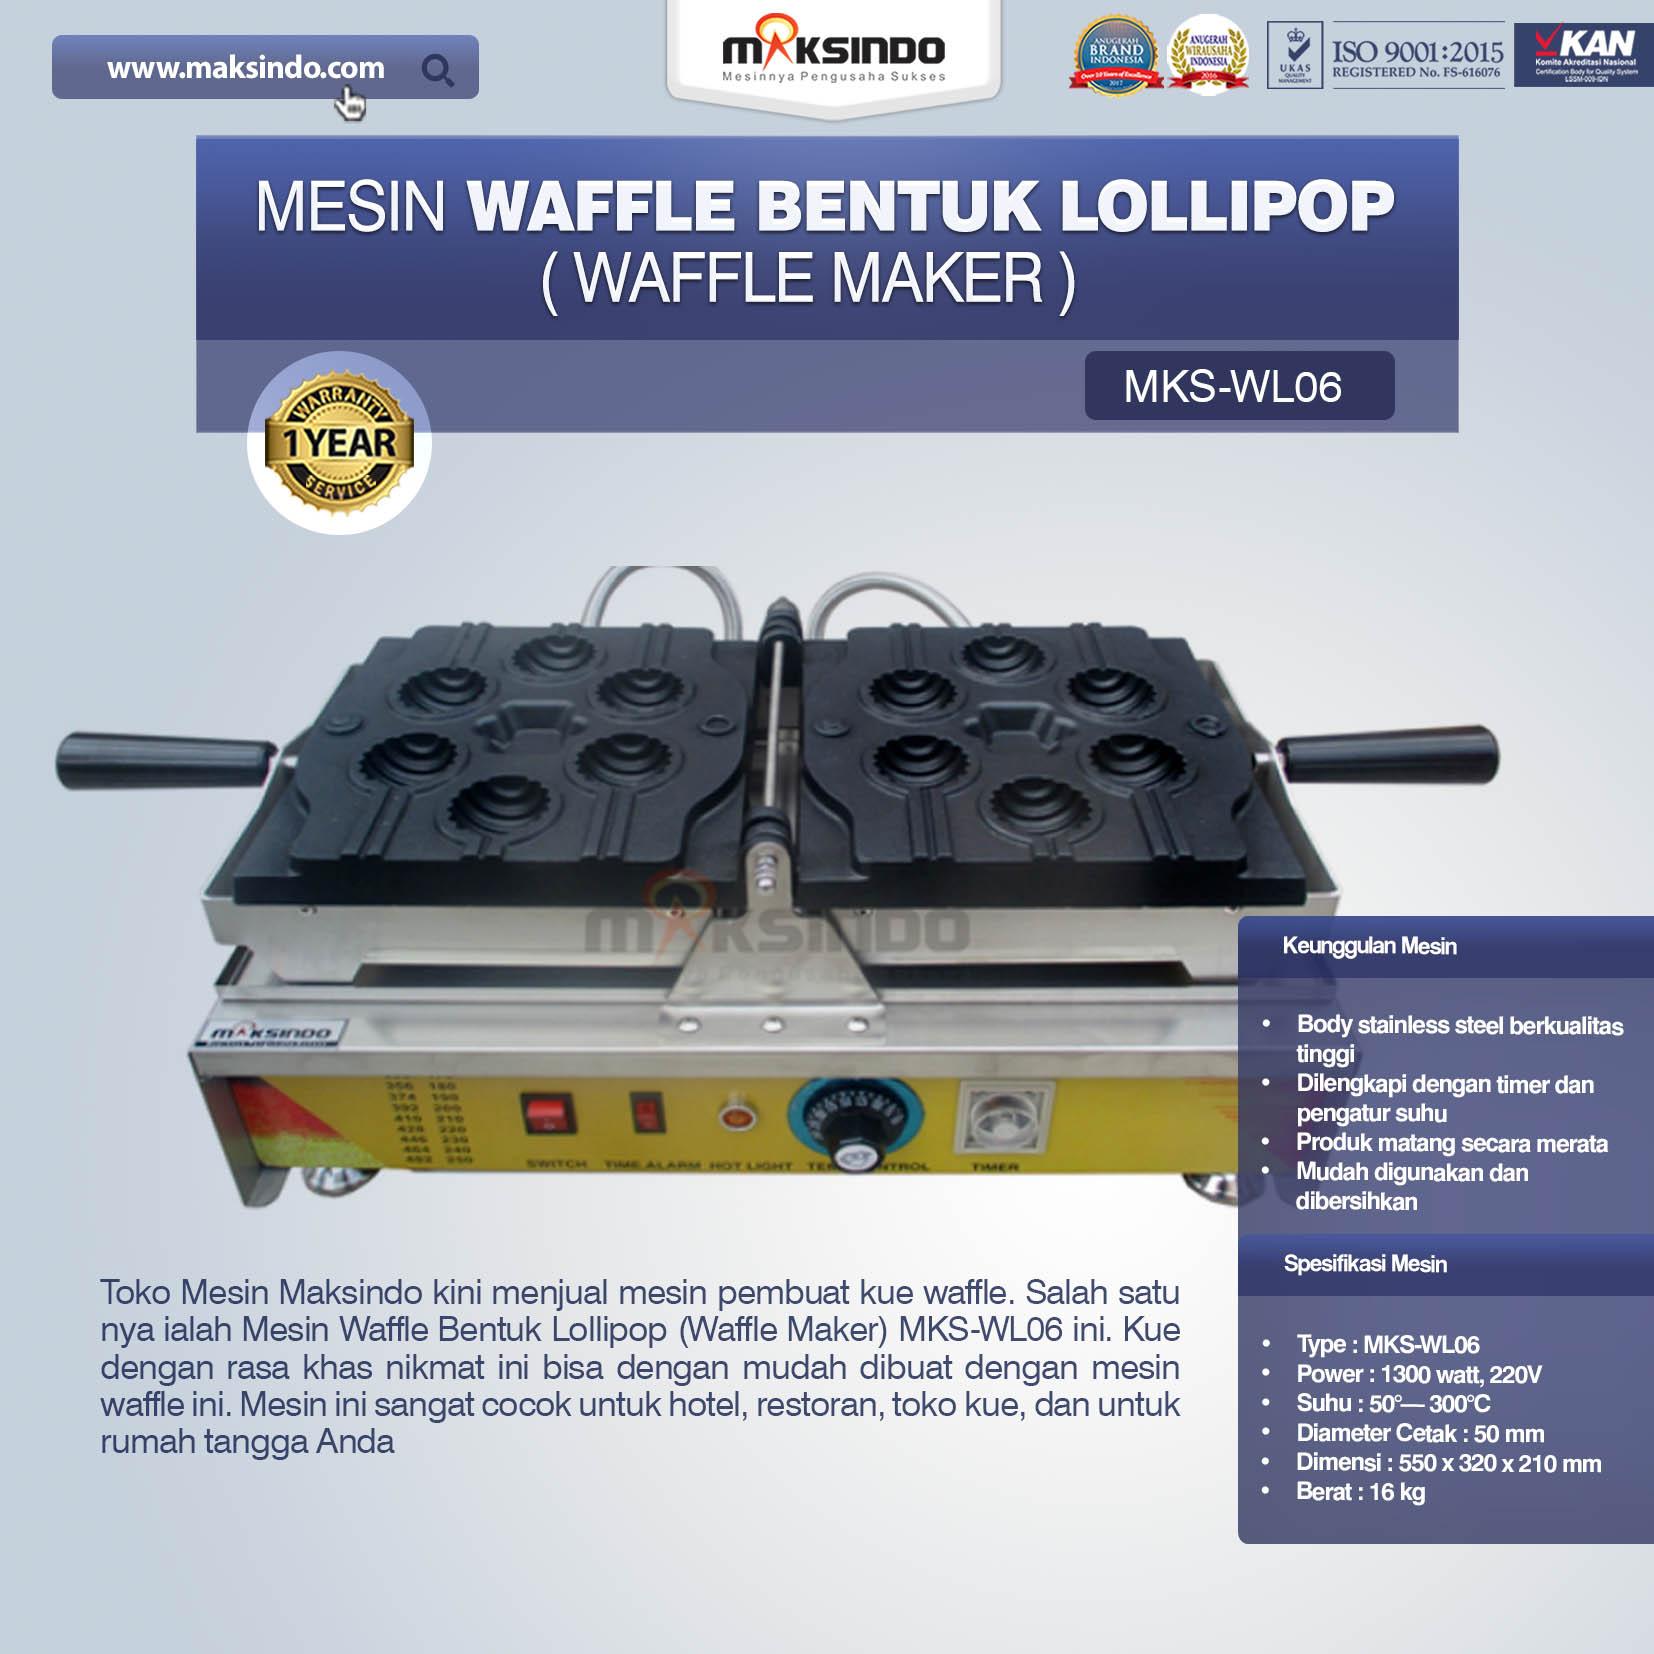 Mesin Waffle Bentuk Lollipop (Waffle Maker) MKS-WL06